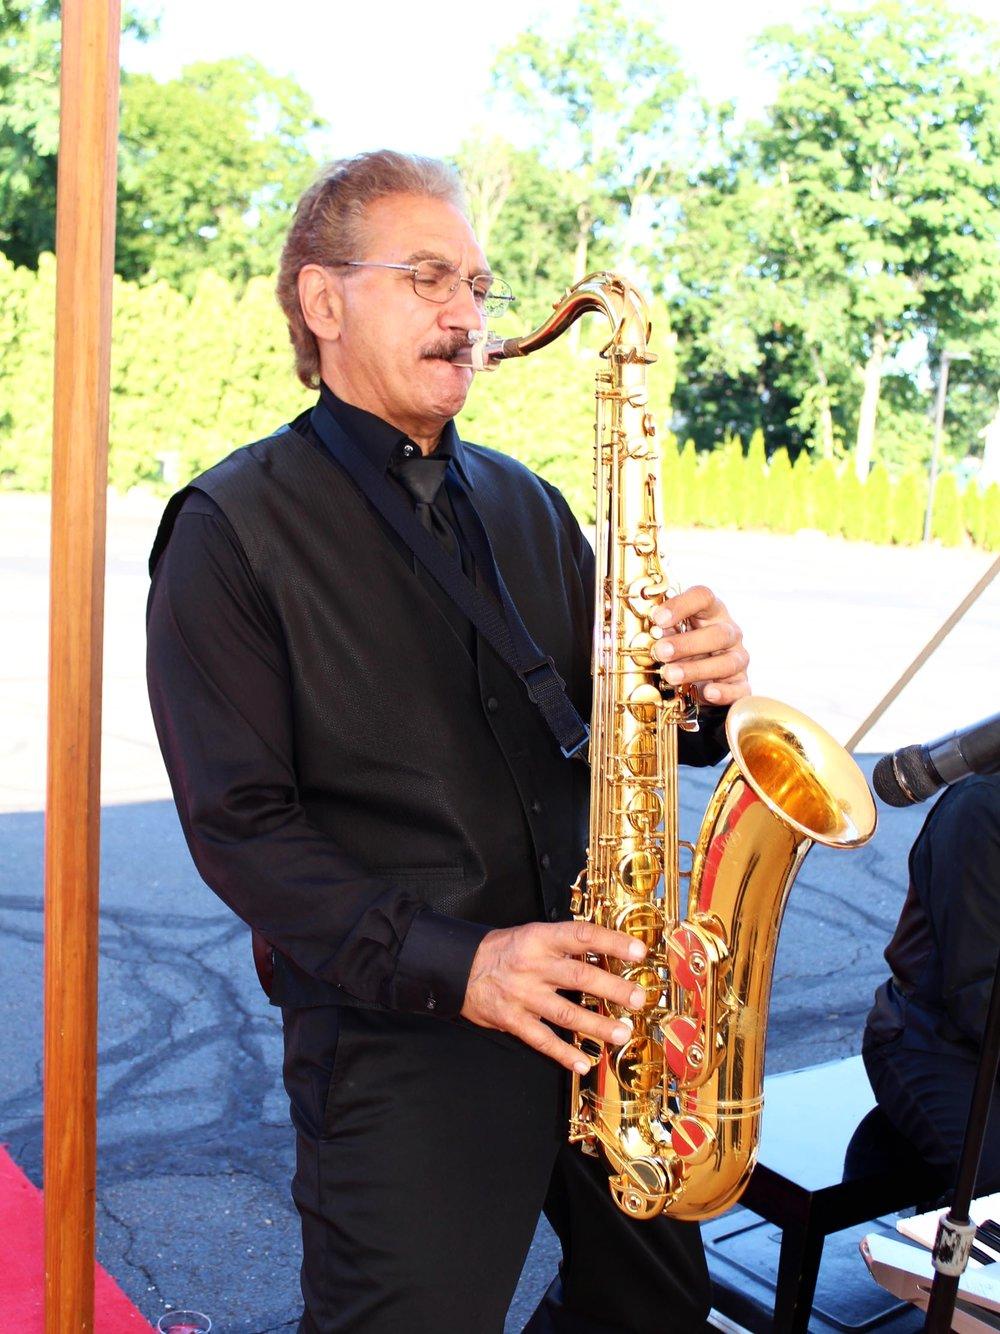 stolen-moments-live-music-jazz-saxophone-08.jpg